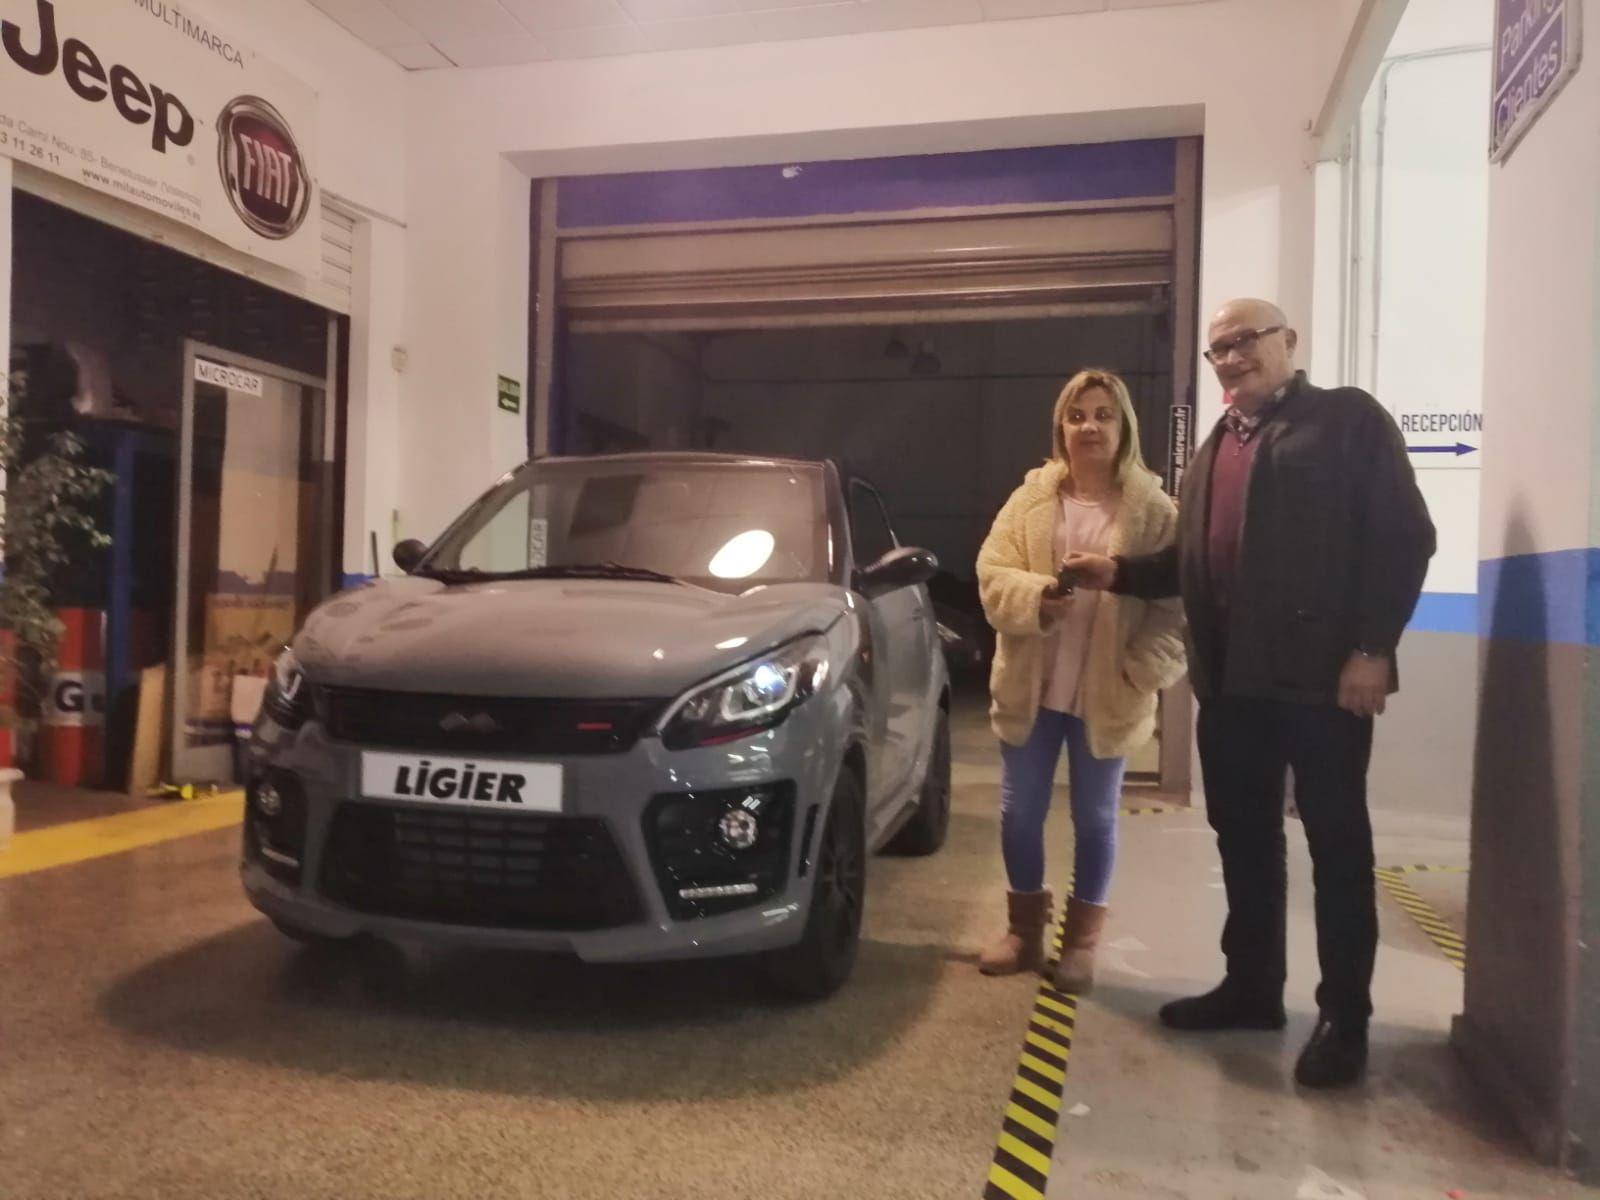 Milautomóviles entrega un  LigierJS50 Sport a María